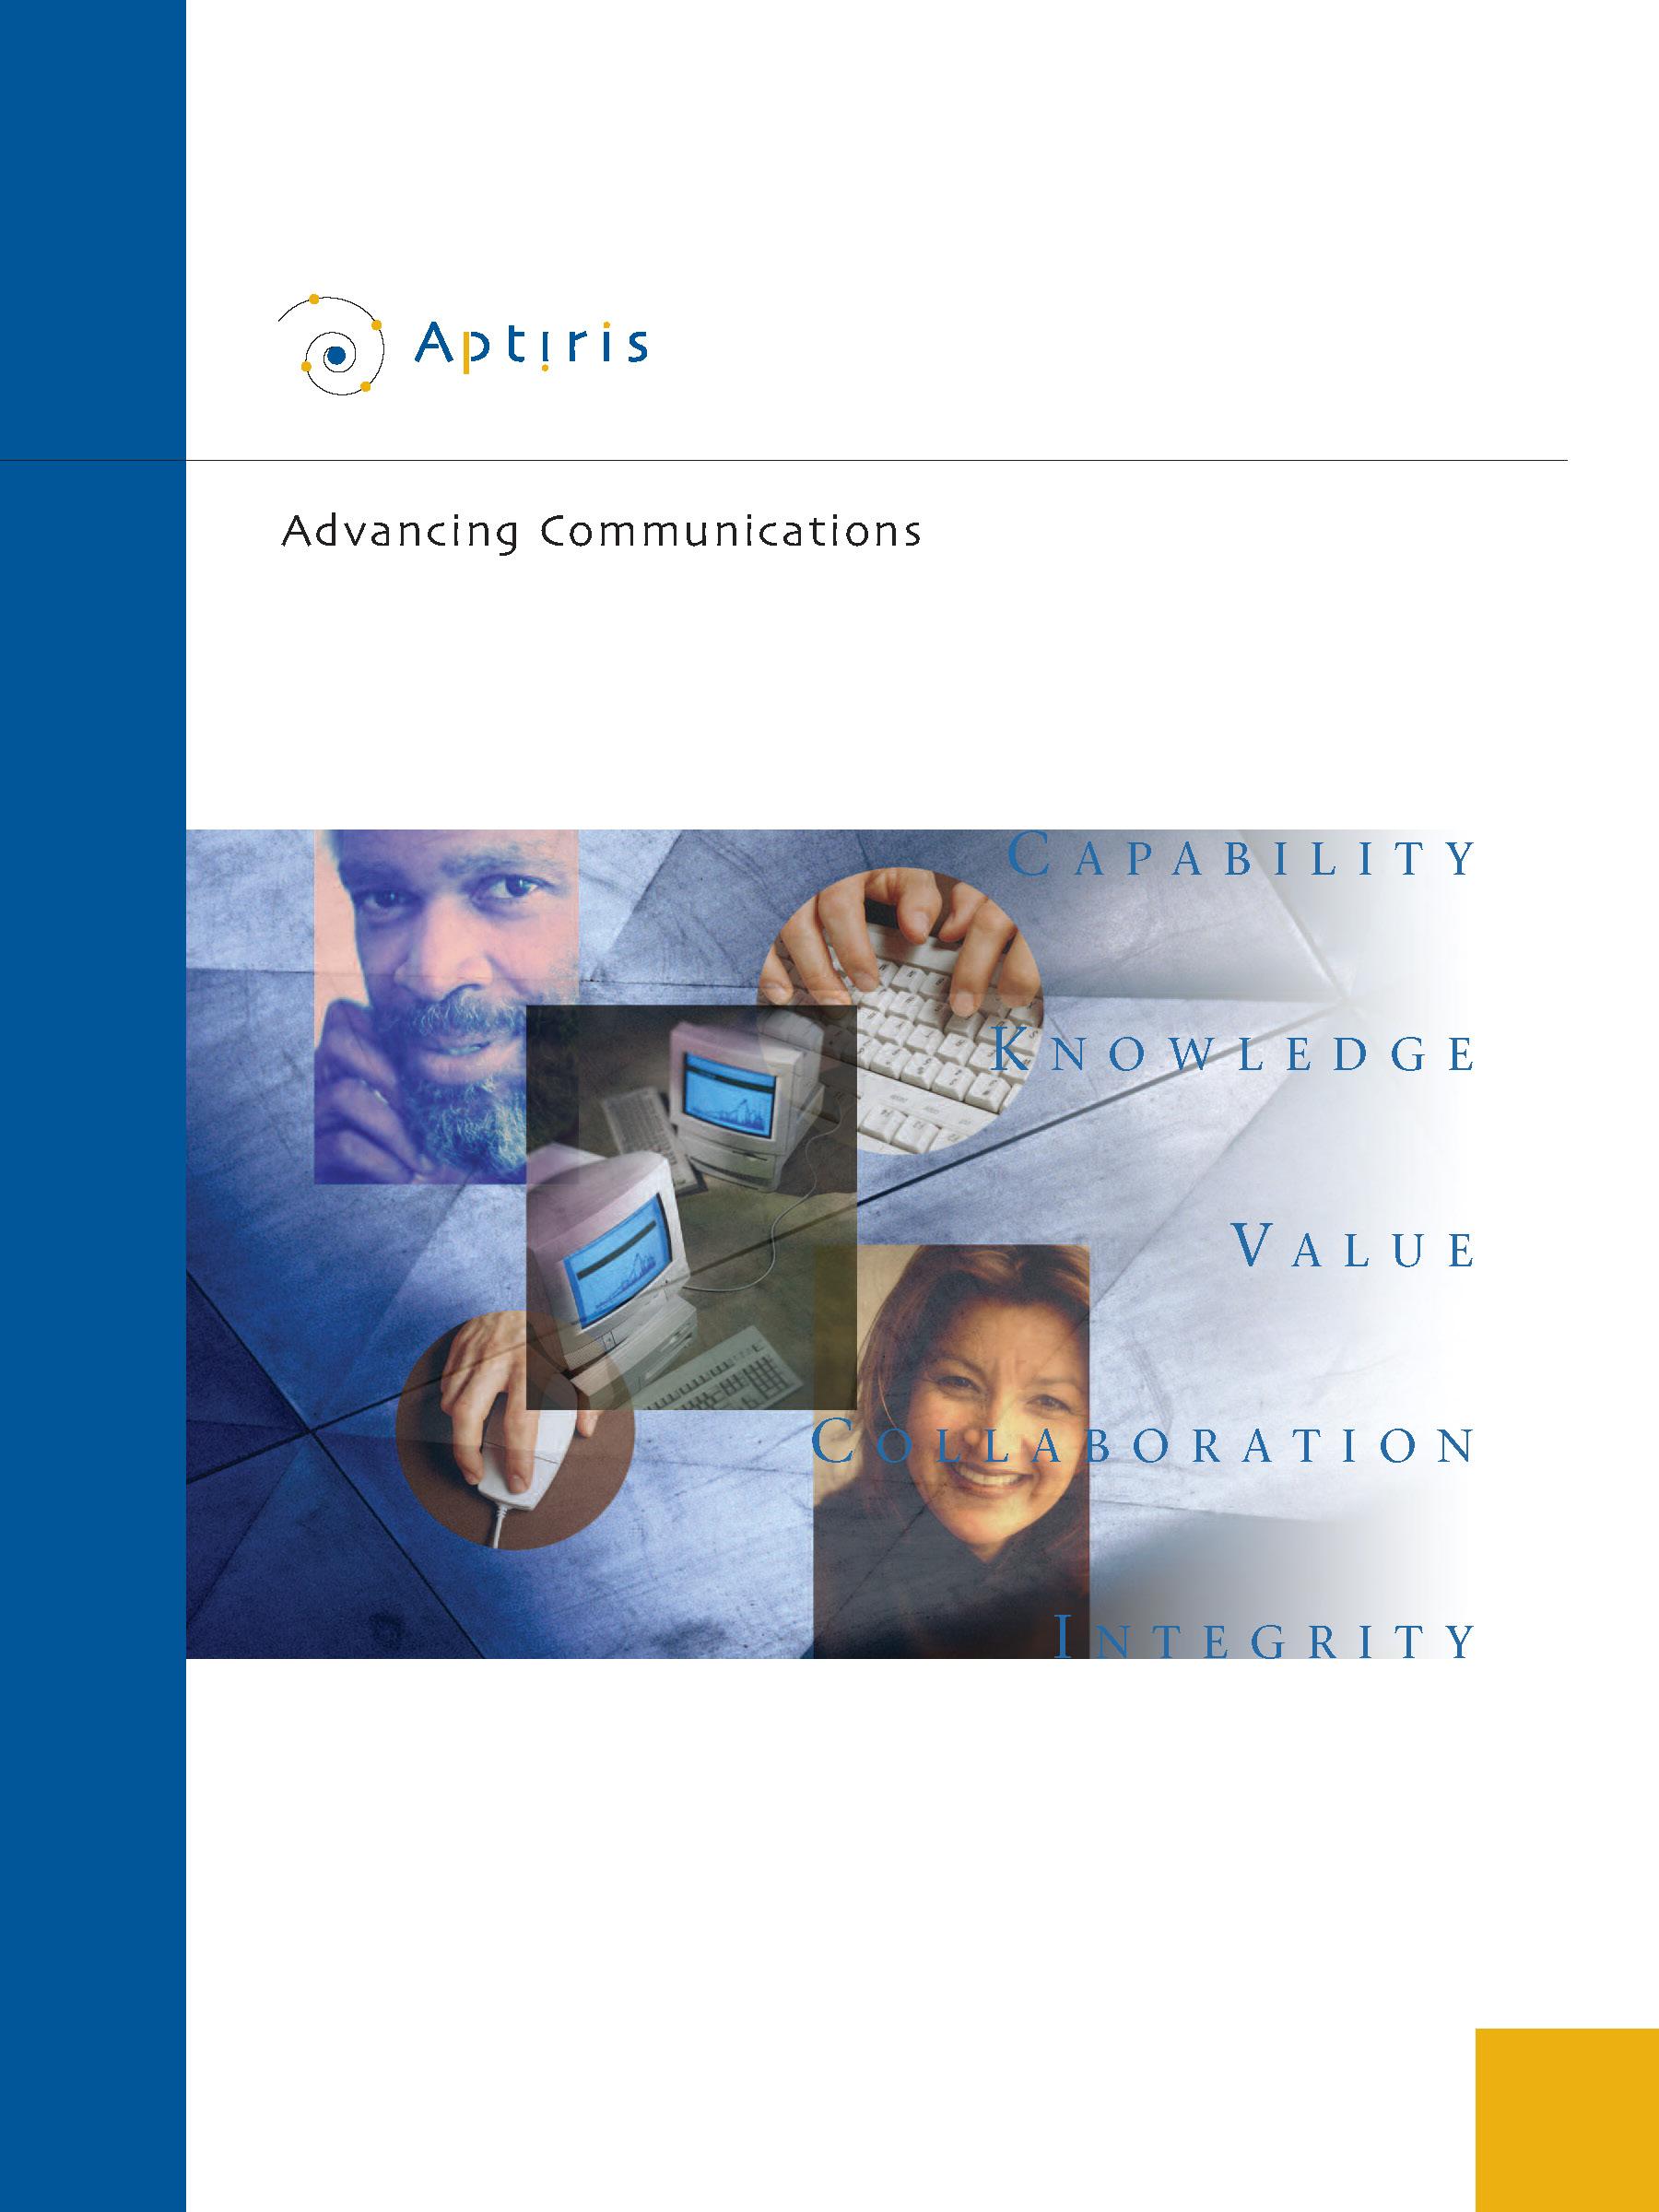 Aptiris Marketing Collateral Pocketfolder